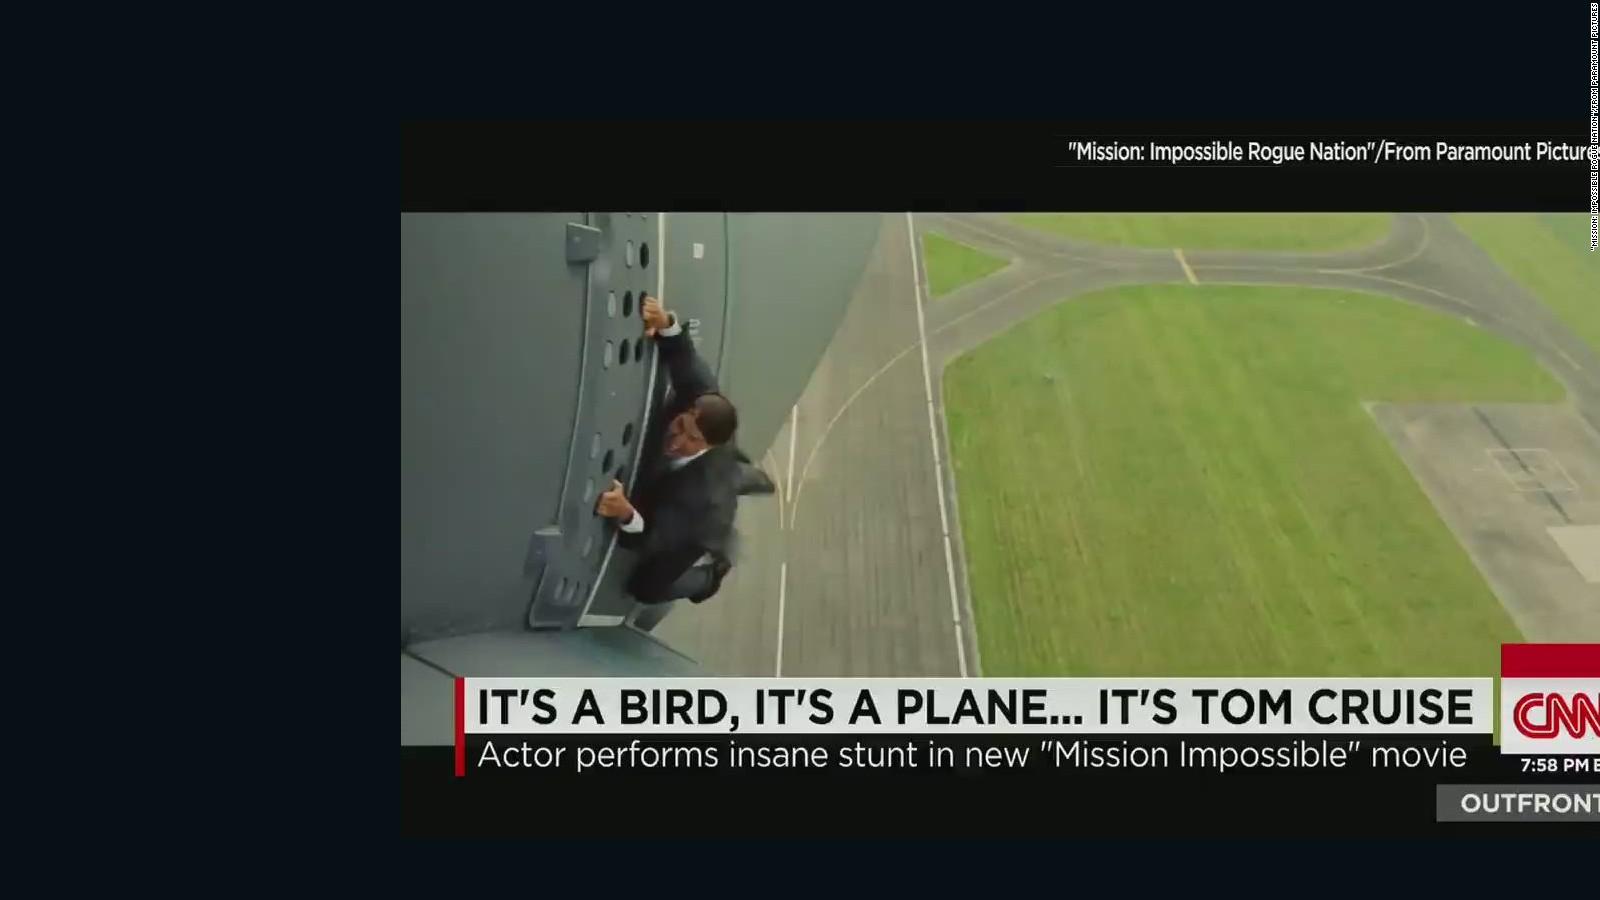 How Tom Cruise Dangled From Moving Plane Cnn